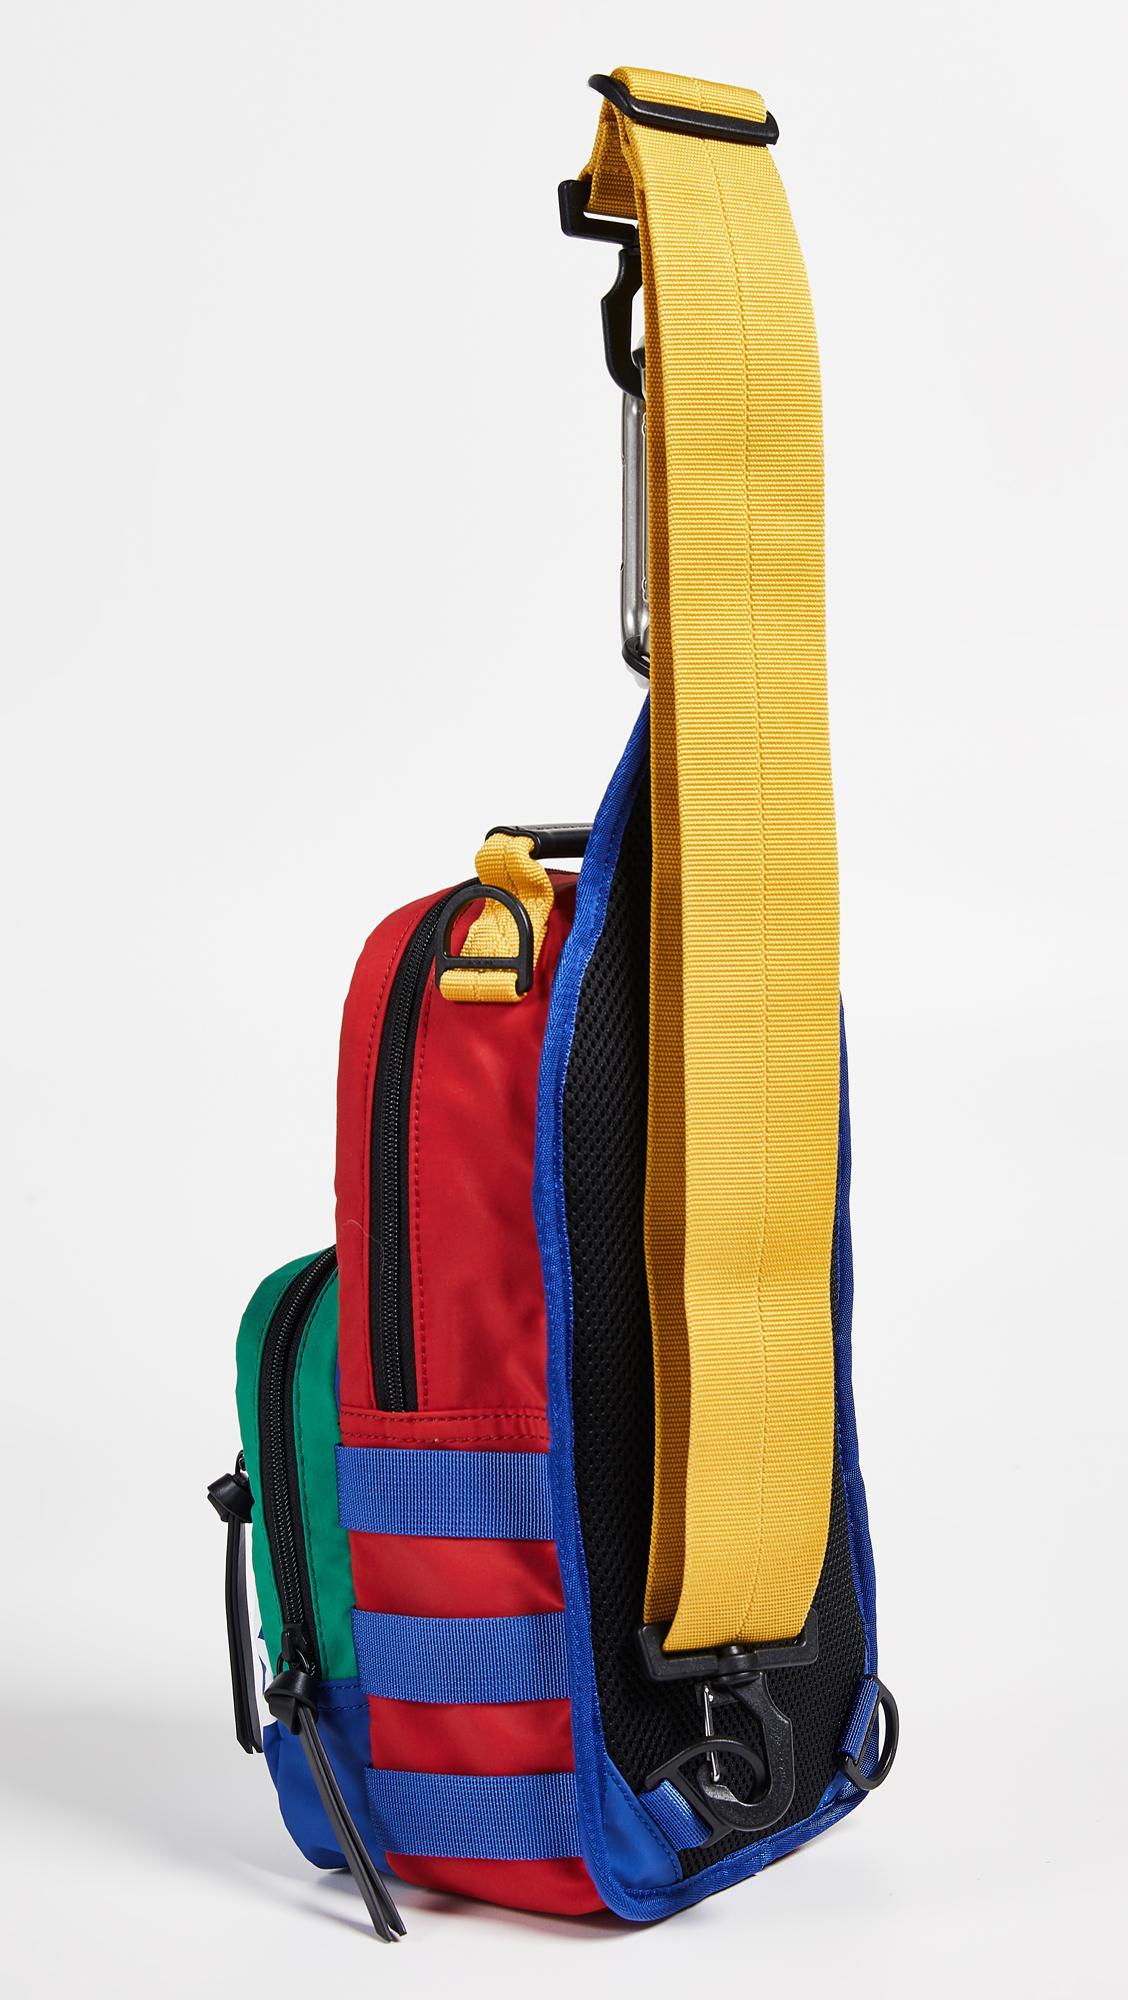 8c52806d95 Lyst - Polo Ralph Lauren Hi Tech Sling Bag for Men